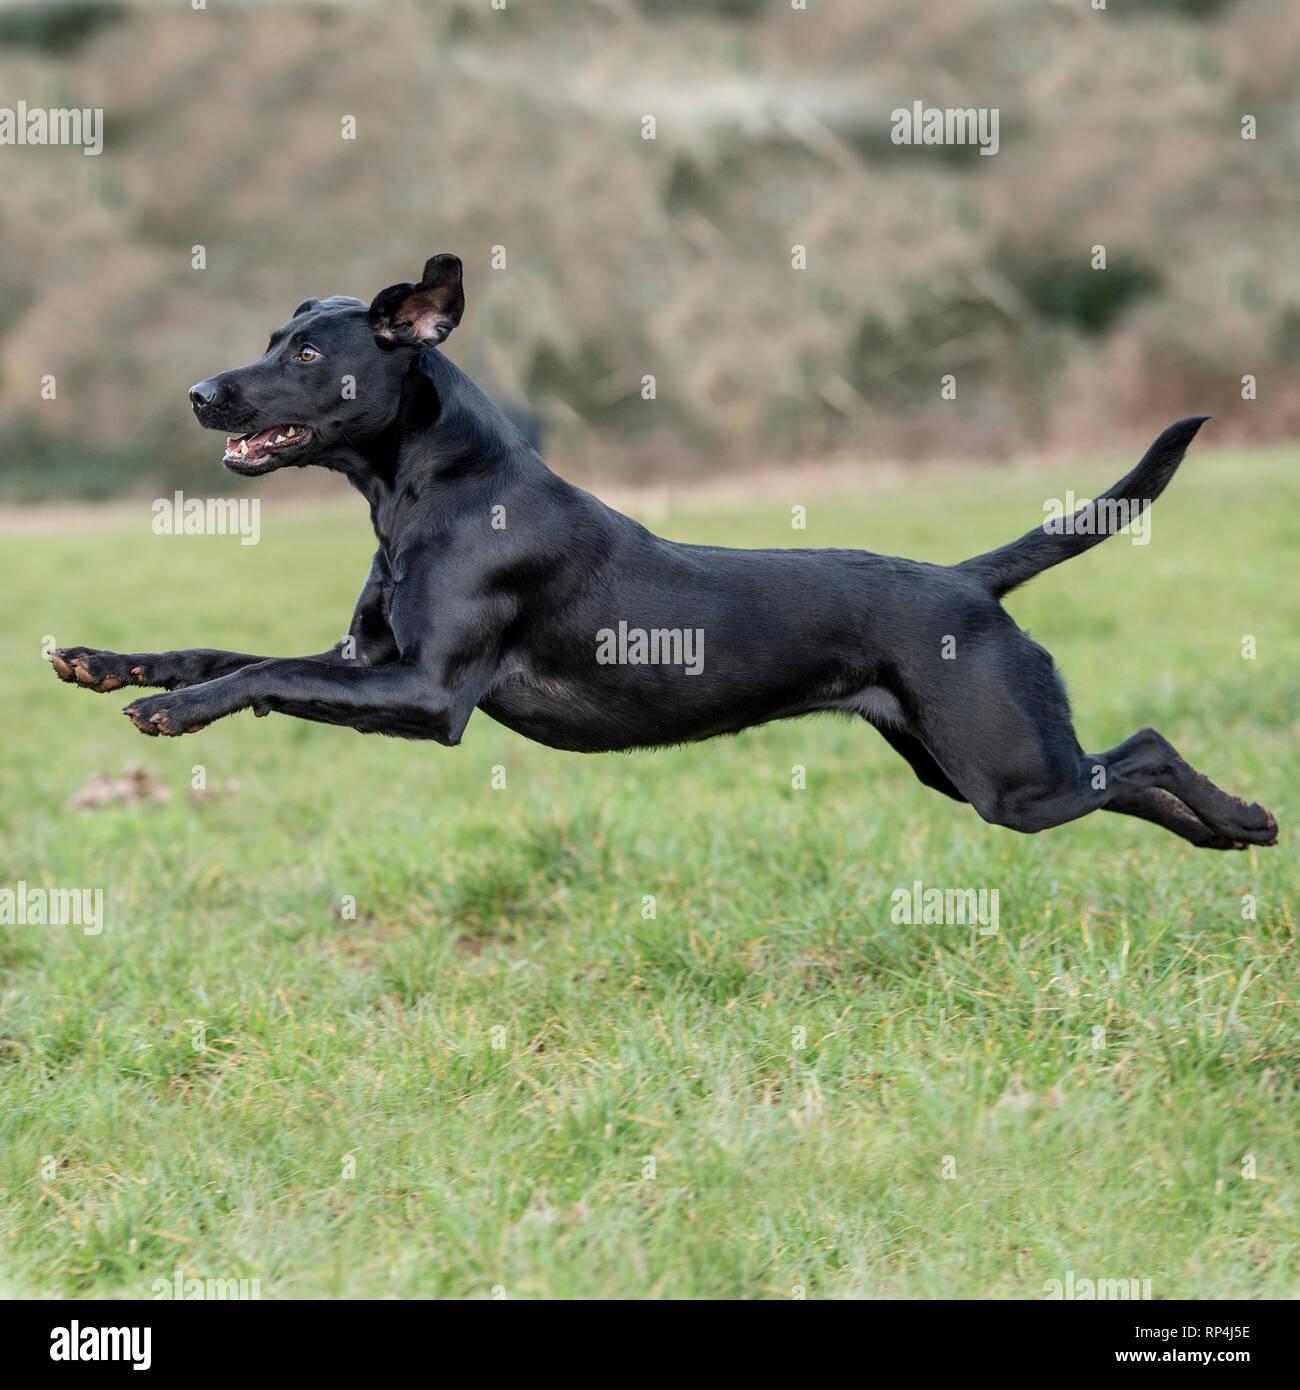 black labrador retriever running - Stock Image